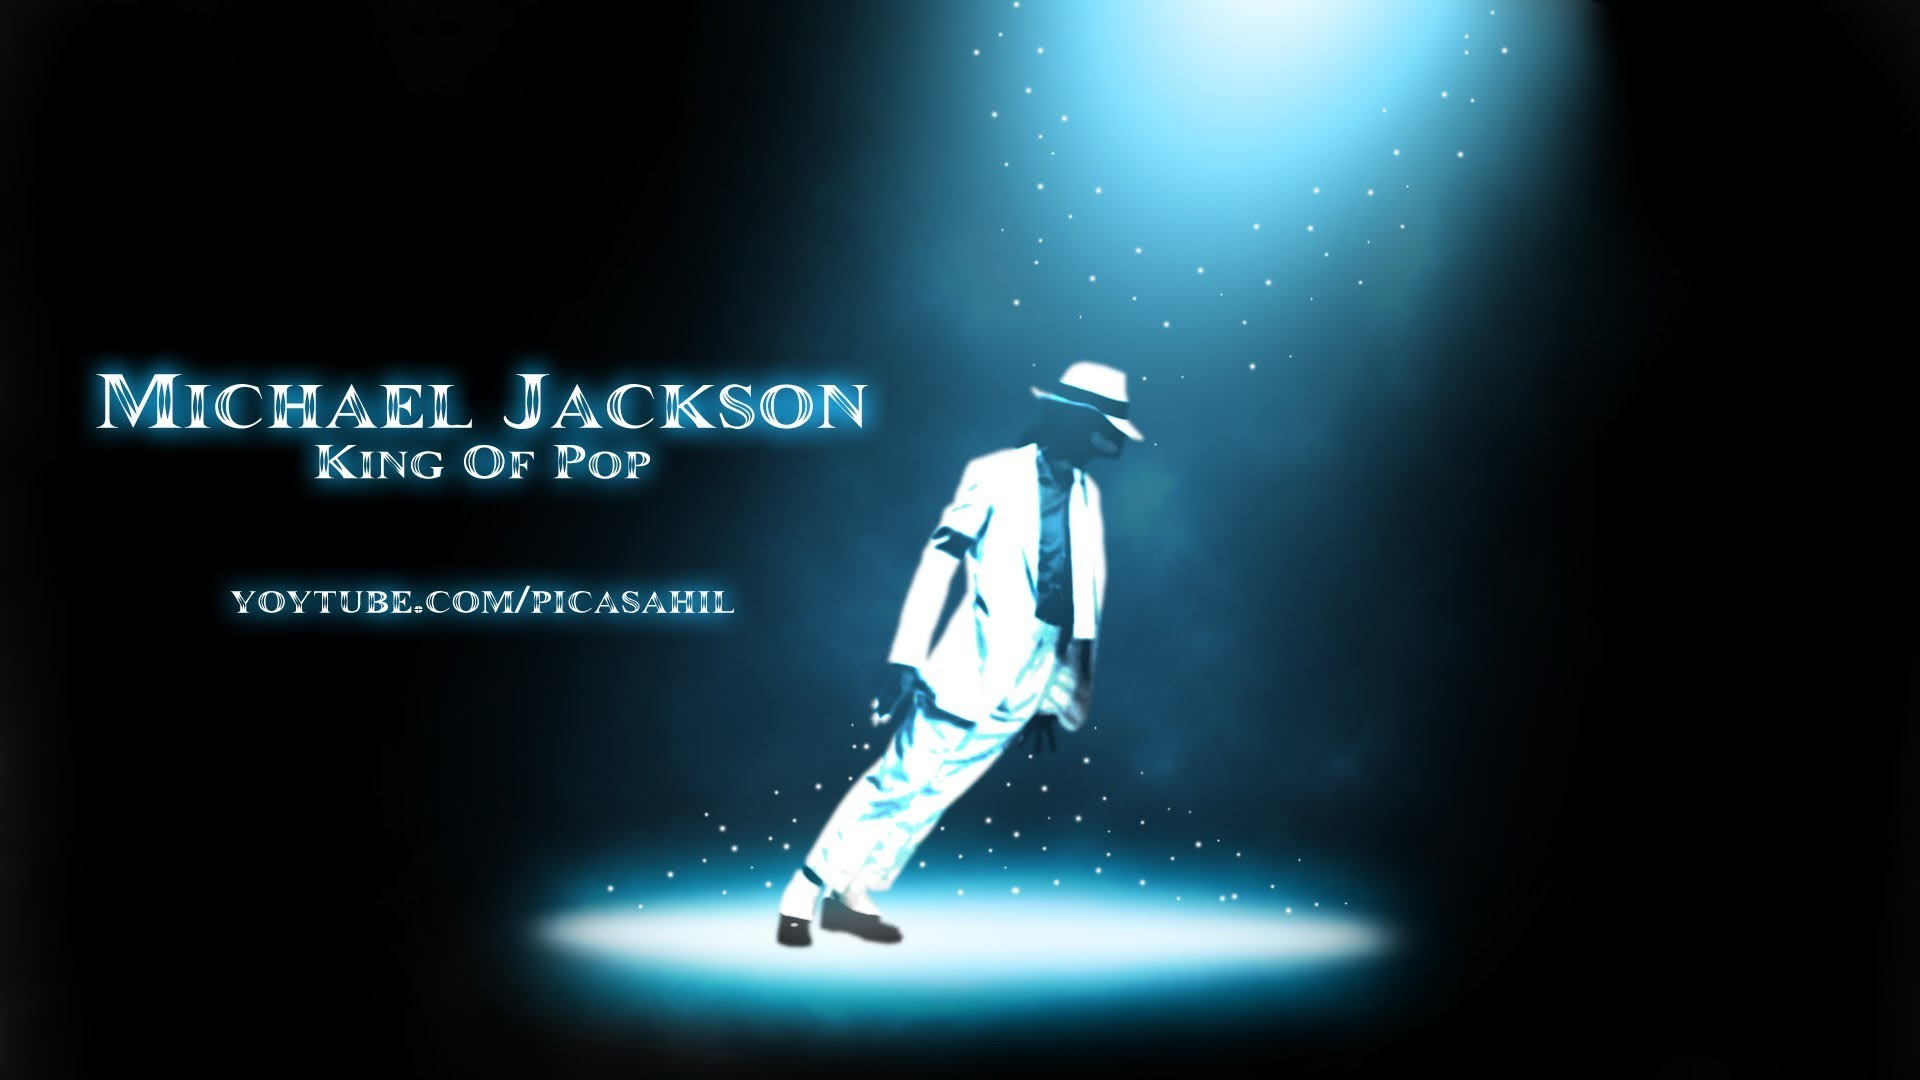 Michael Jackson Wallpaper Smooth Criminal 81 Images